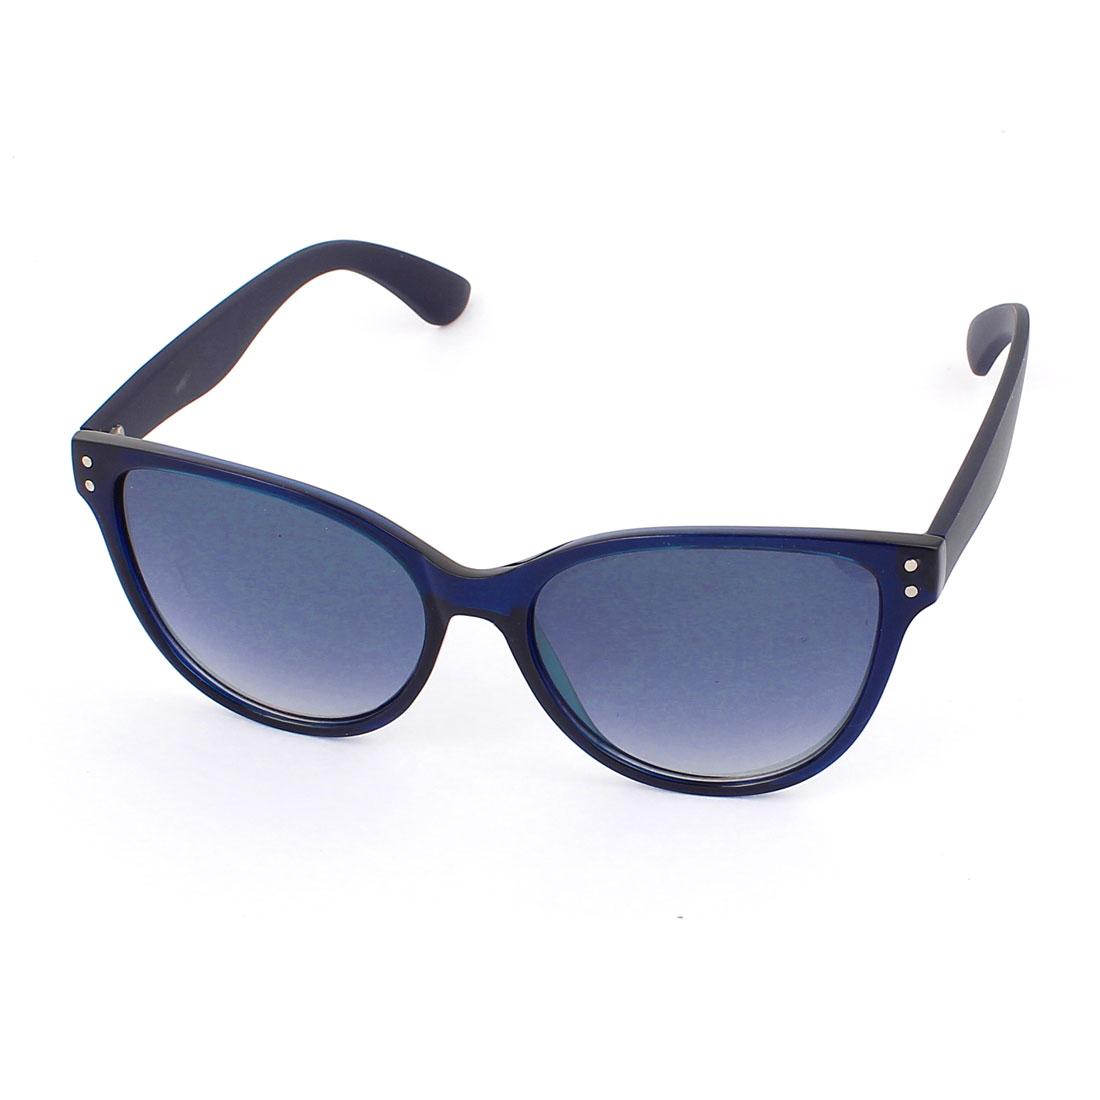 Unisex Plastic Full Rim Gradient Lens Single Bridge Sunglasses Eyeswear Glasses Eyes Protector Dark Blue